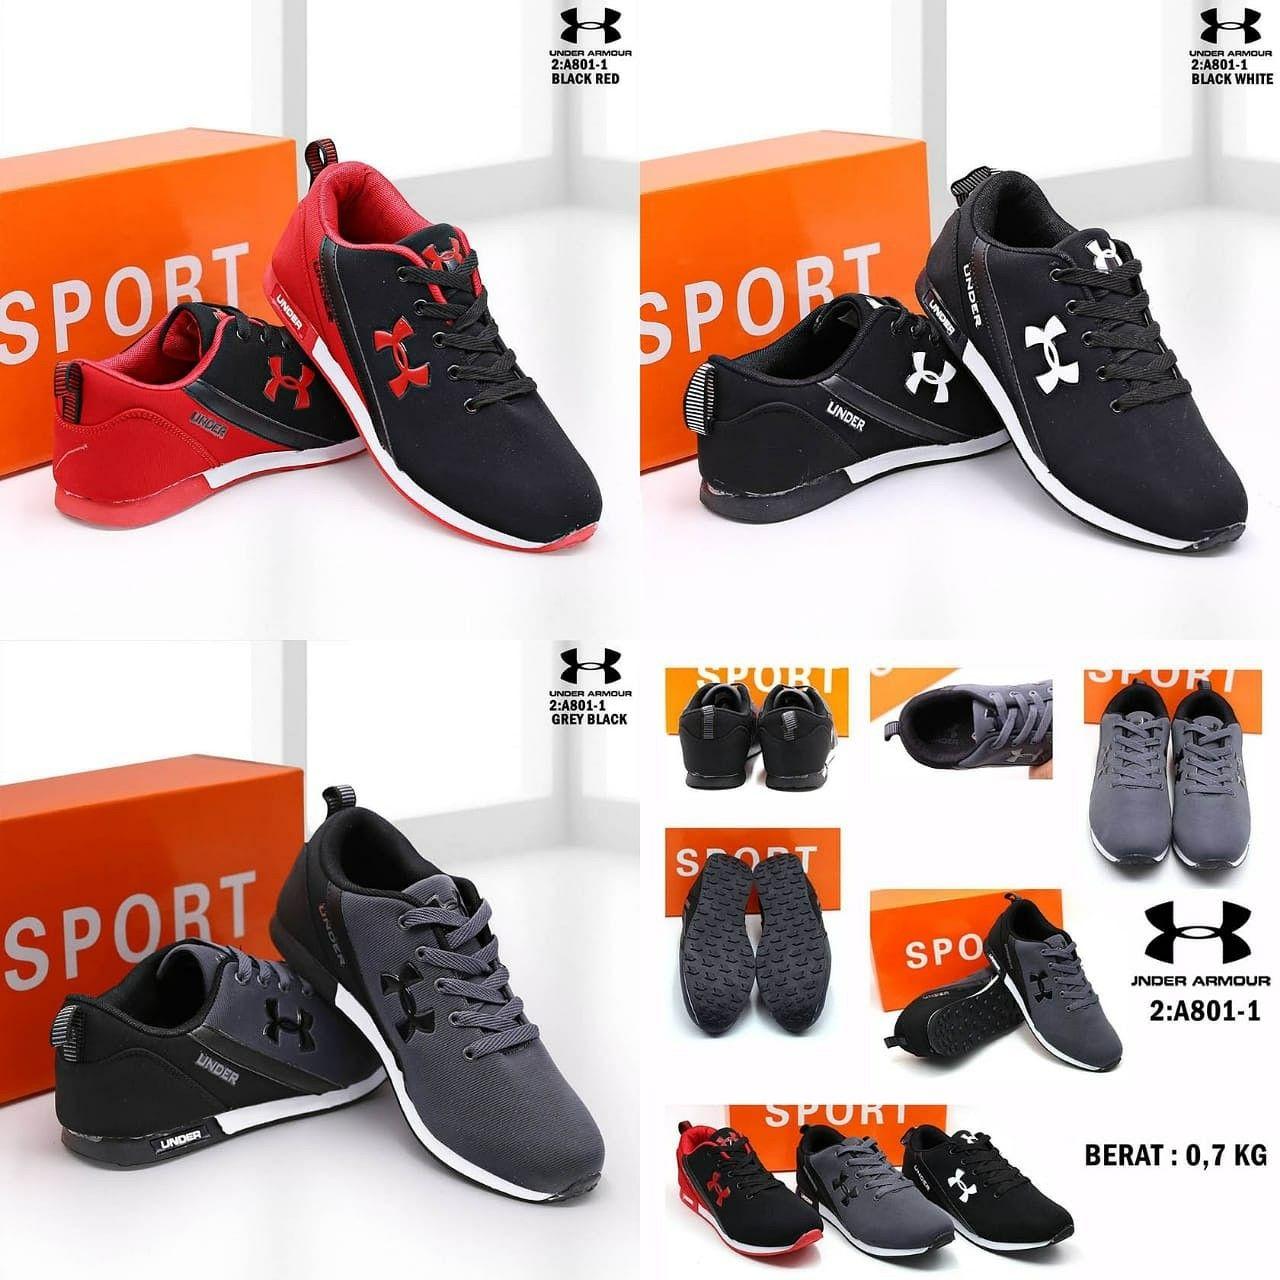 Sepatu Man Merek Under Armour Seri A801 1 Kualitas Semprem